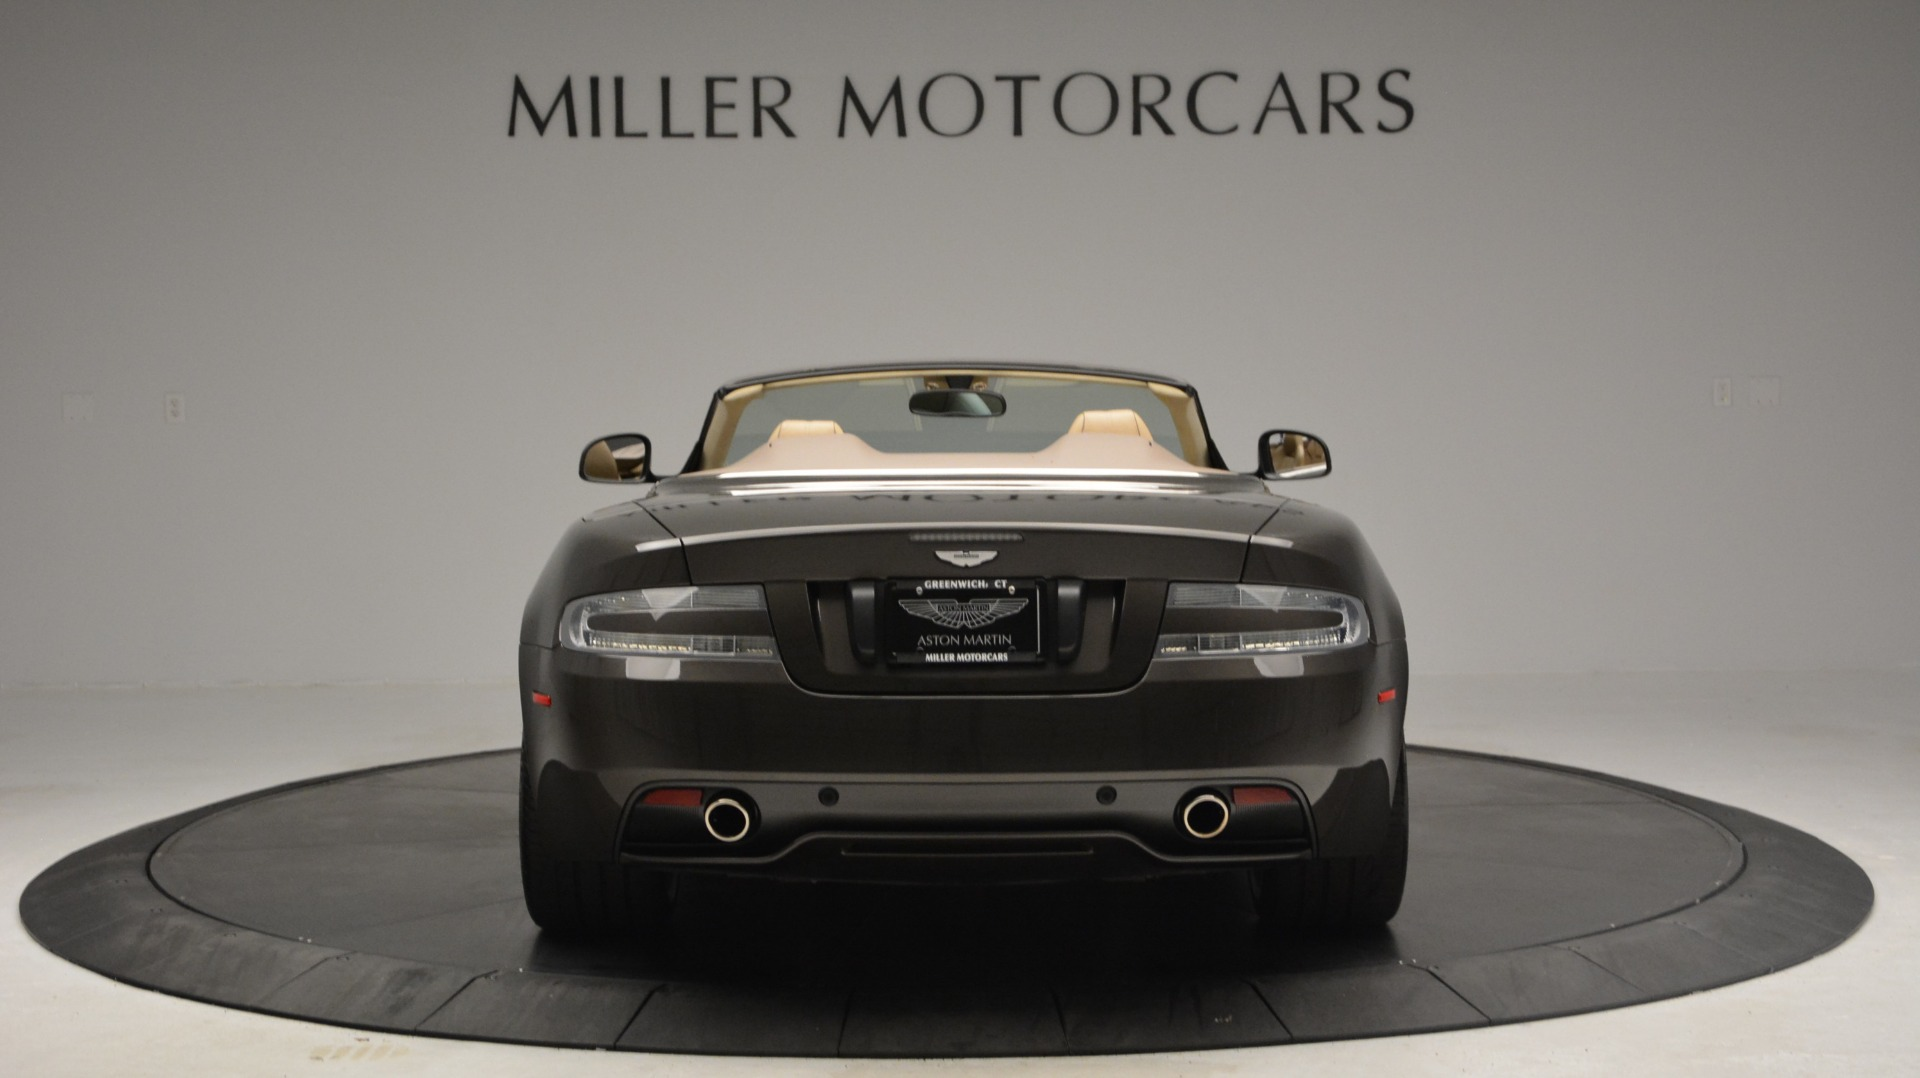 Used 2012 Aston Martin Virage Convertible For Sale In Greenwich, CT. Alfa Romeo of Greenwich, 7613 3351_p6